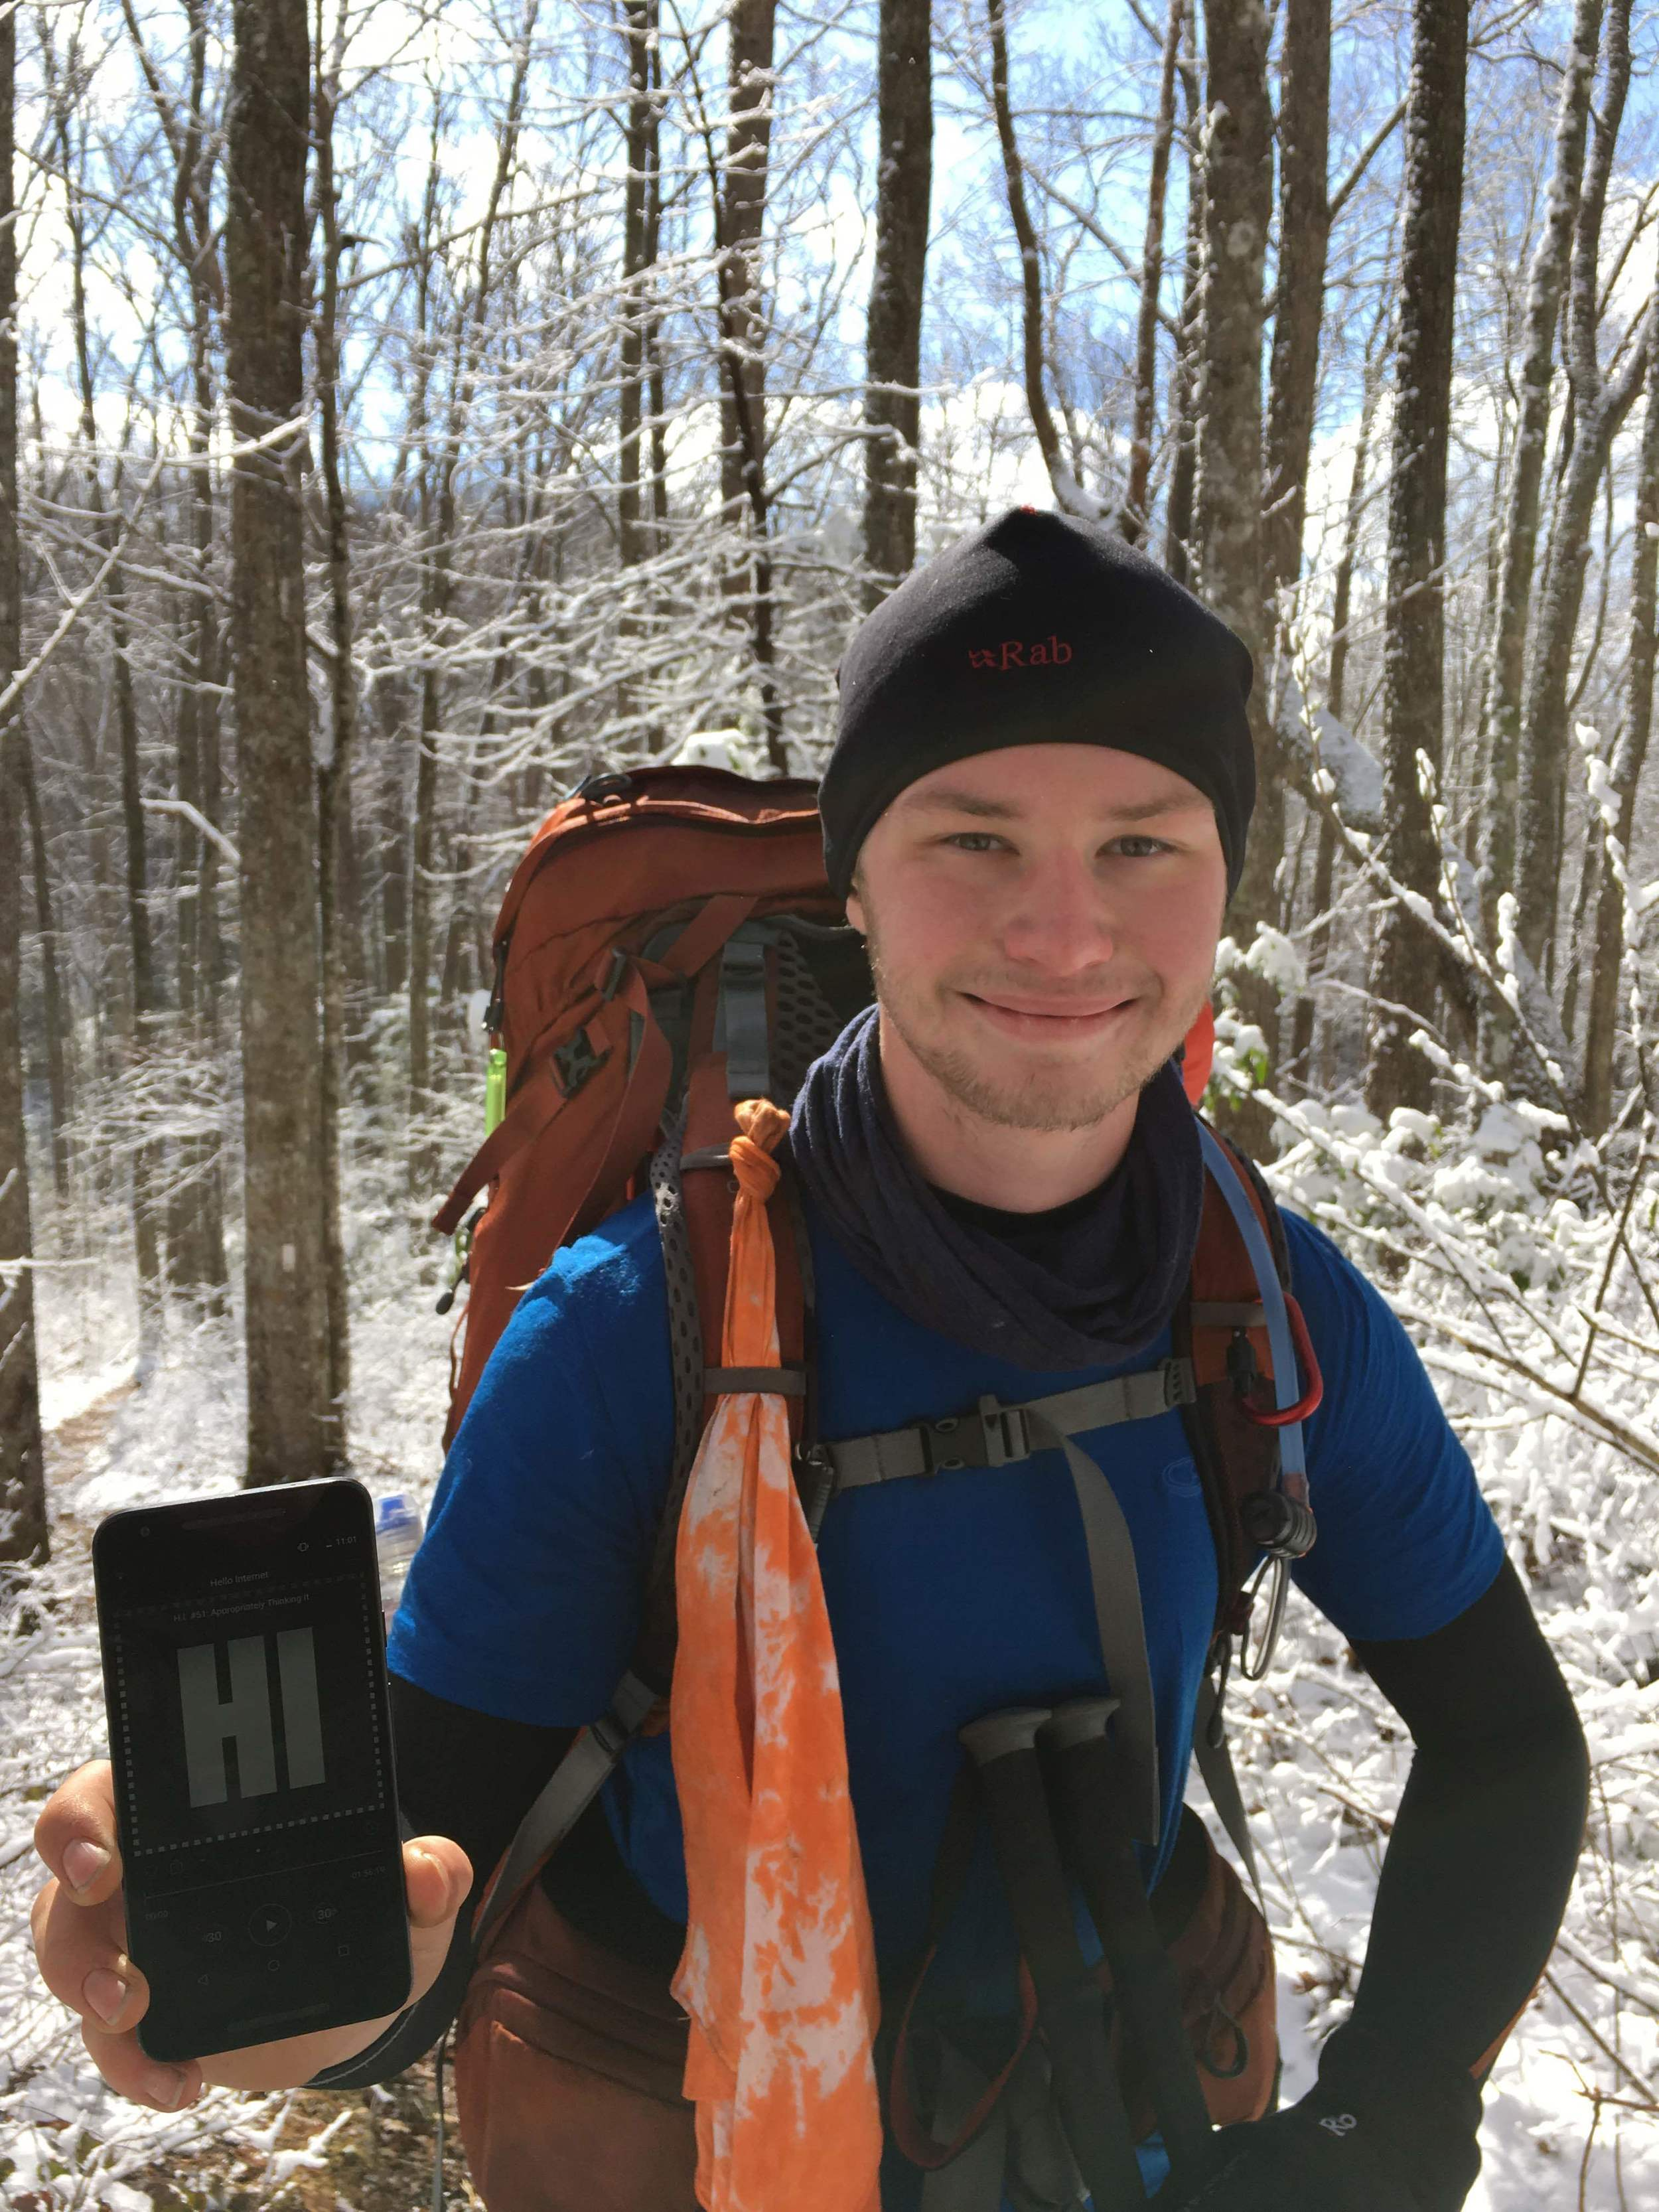 Chris on the Appalachian Trail